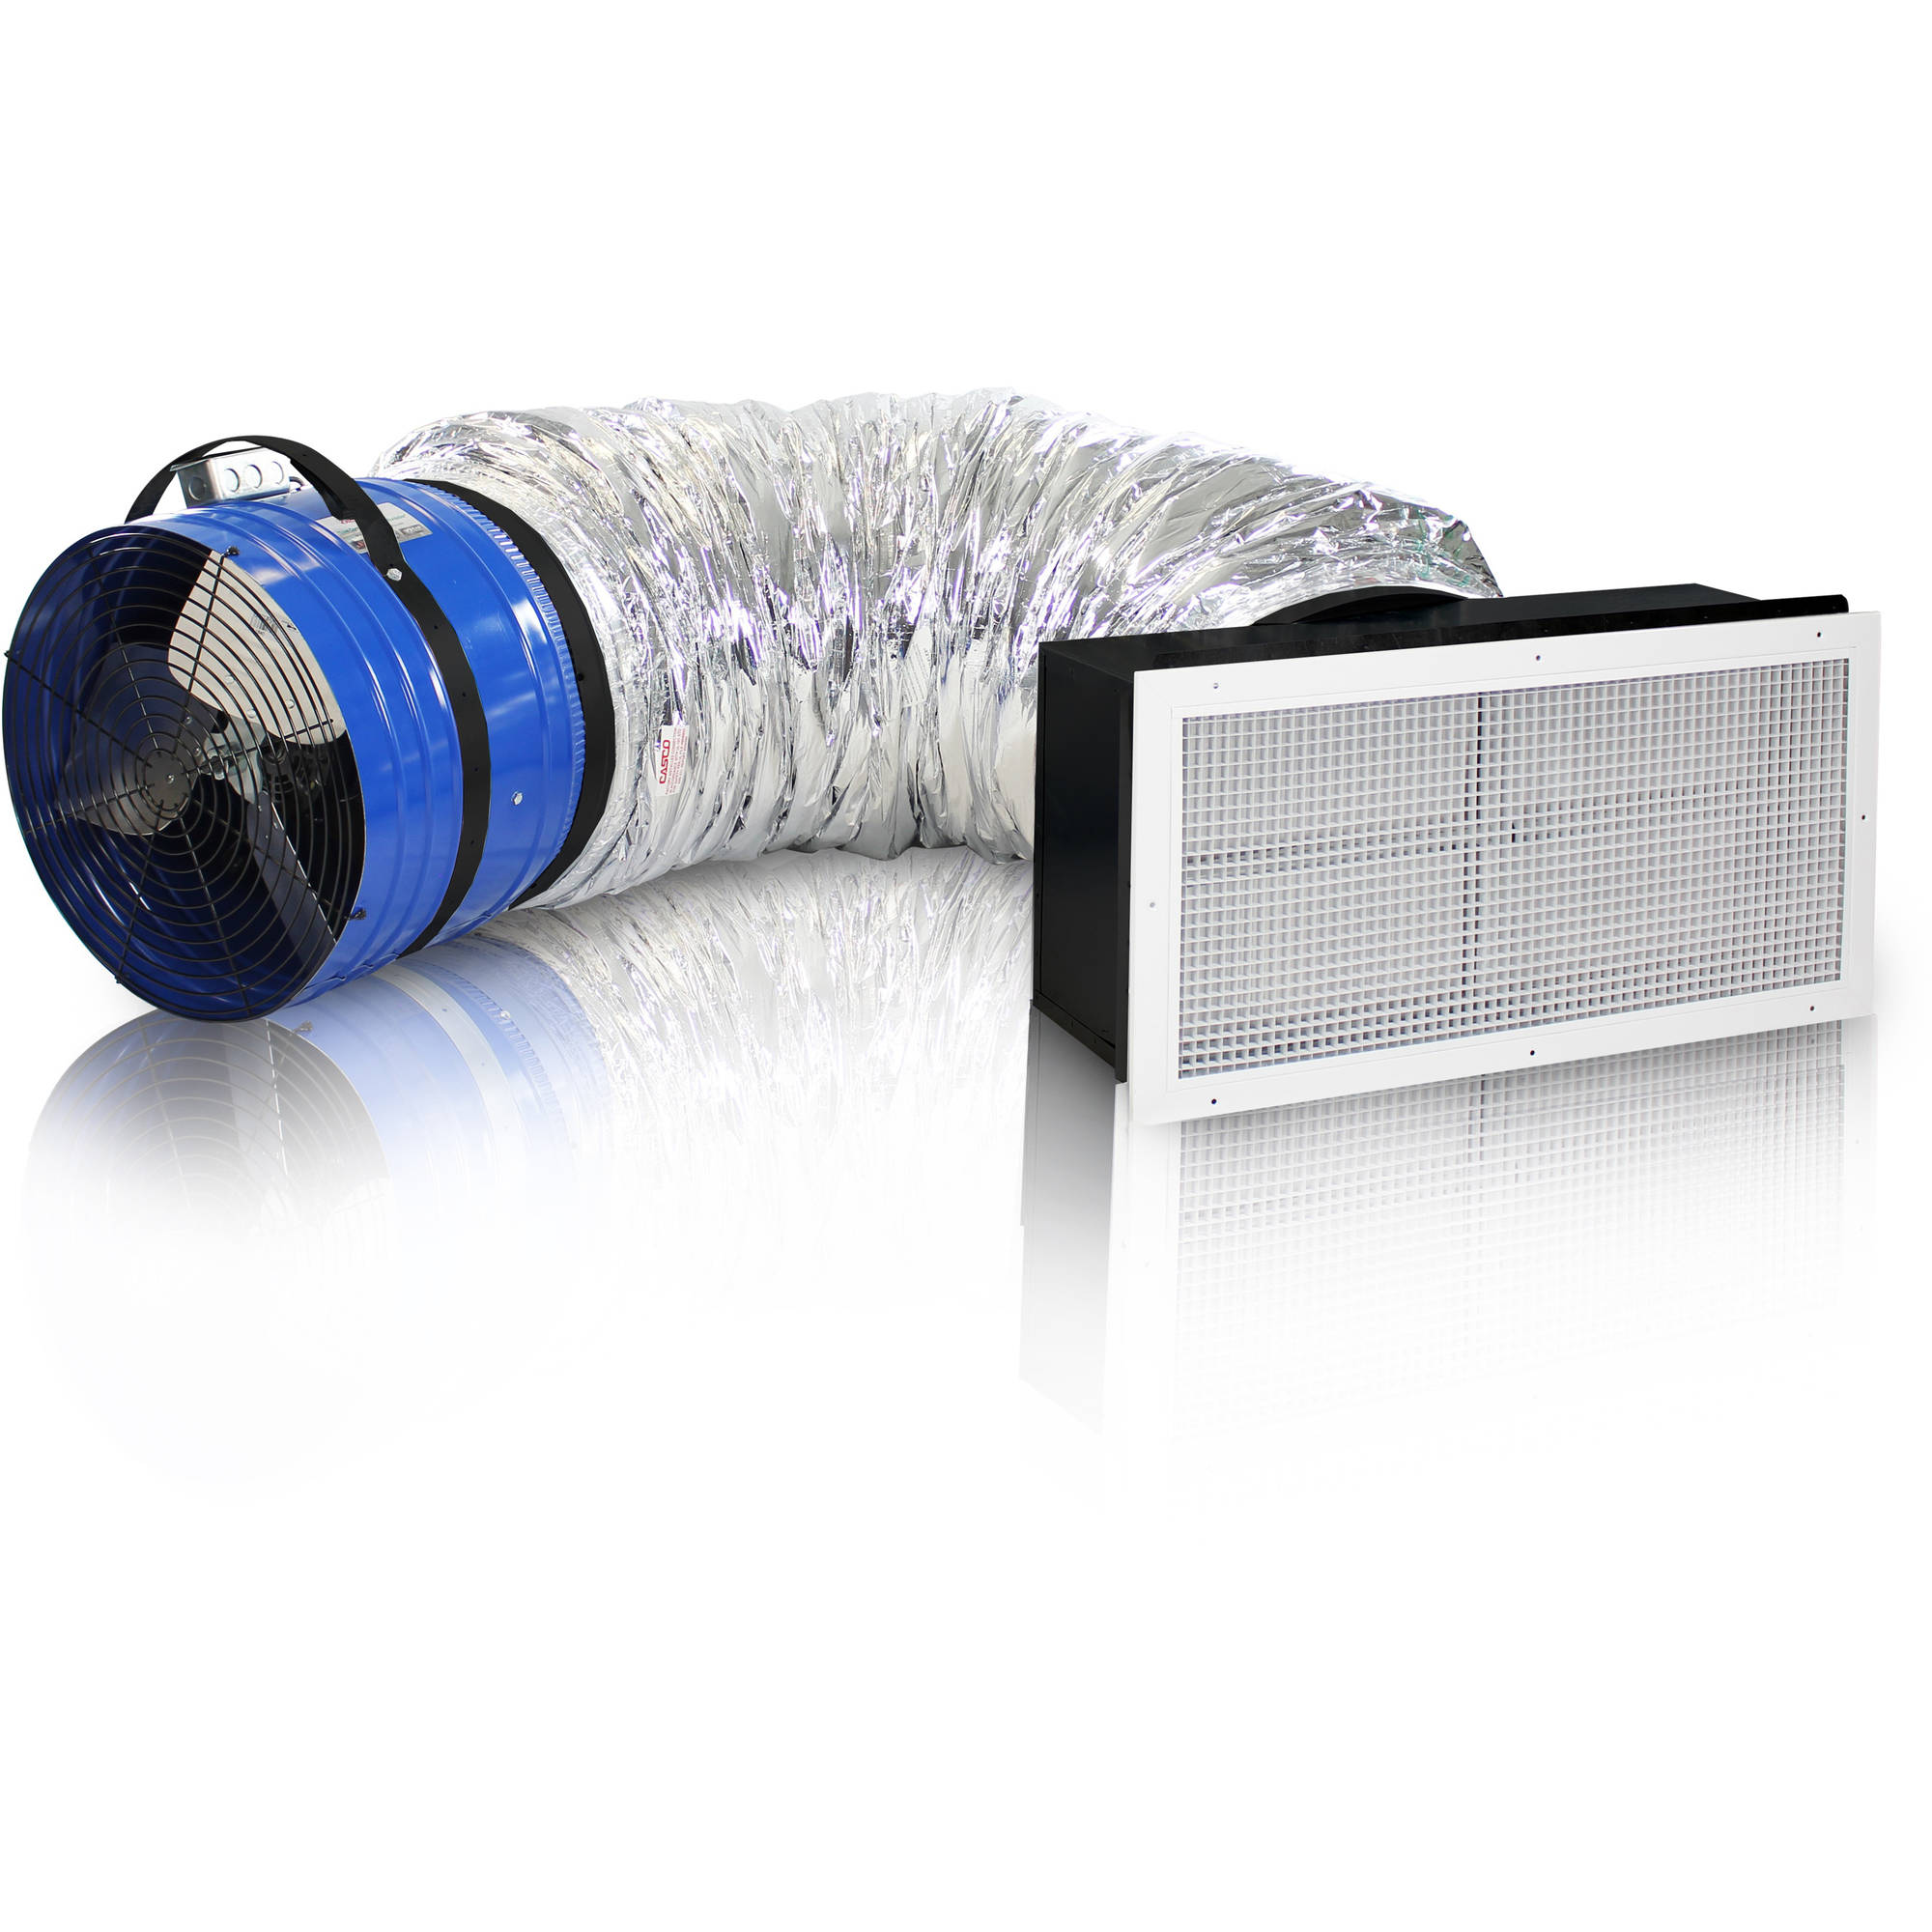 QUIETCOOL QC CL-4700 Whole House Fan,Steel,2-Speed,533W,120V